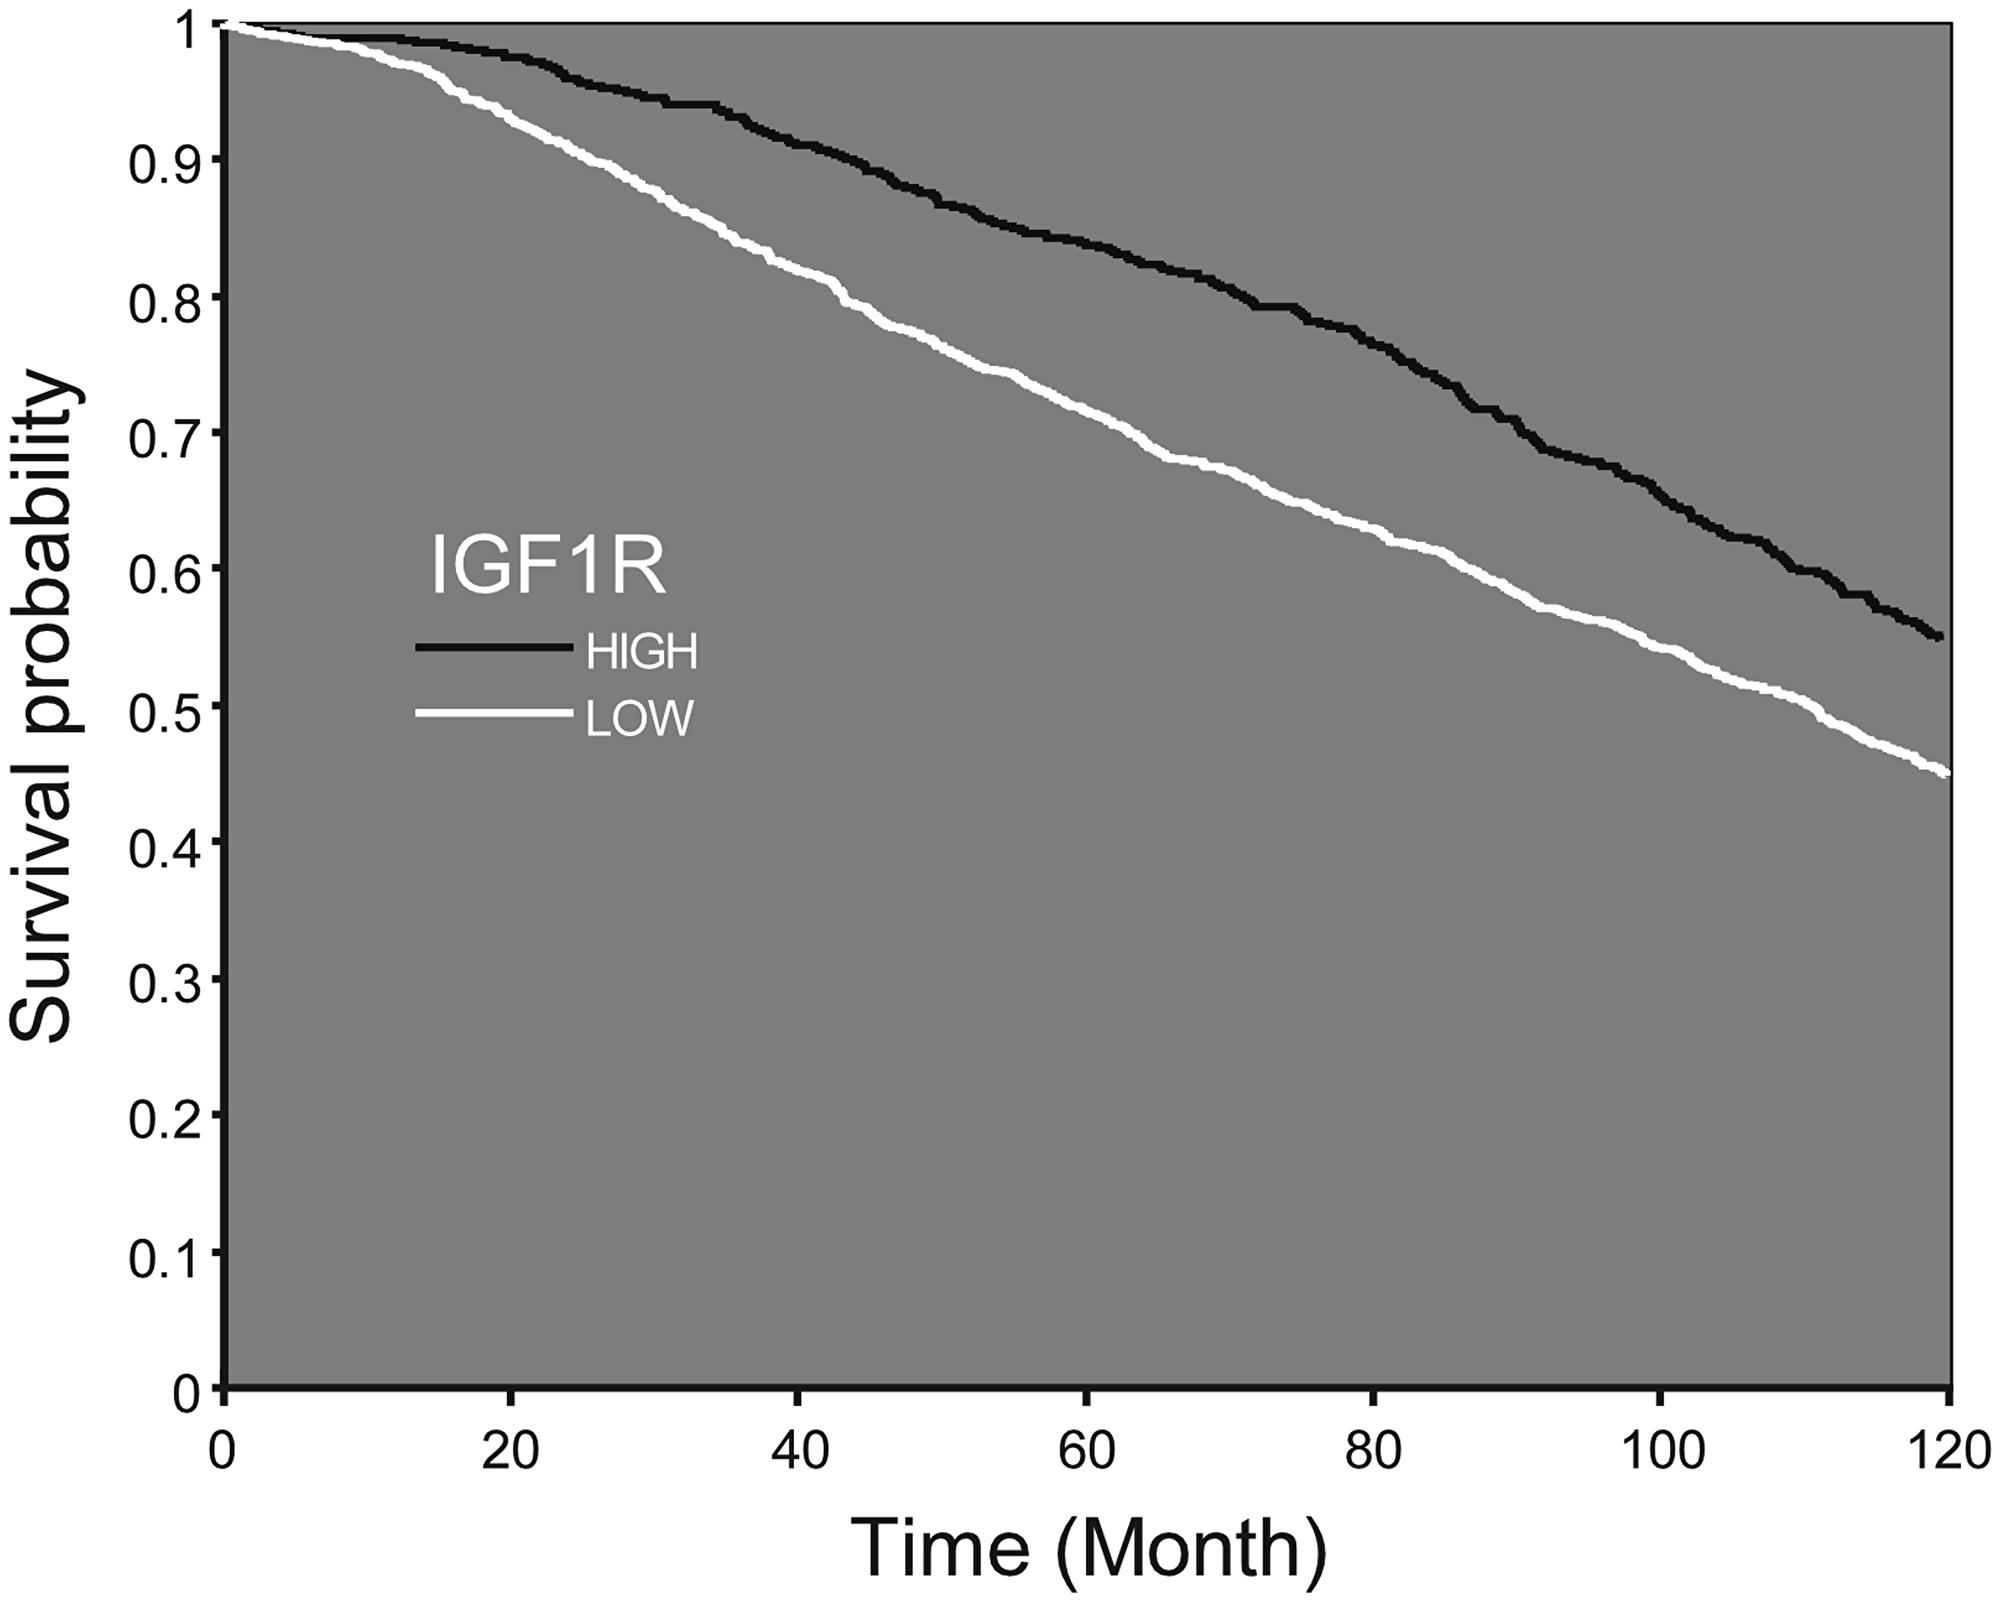 Survival probability according to IGF1R mRNA expression.